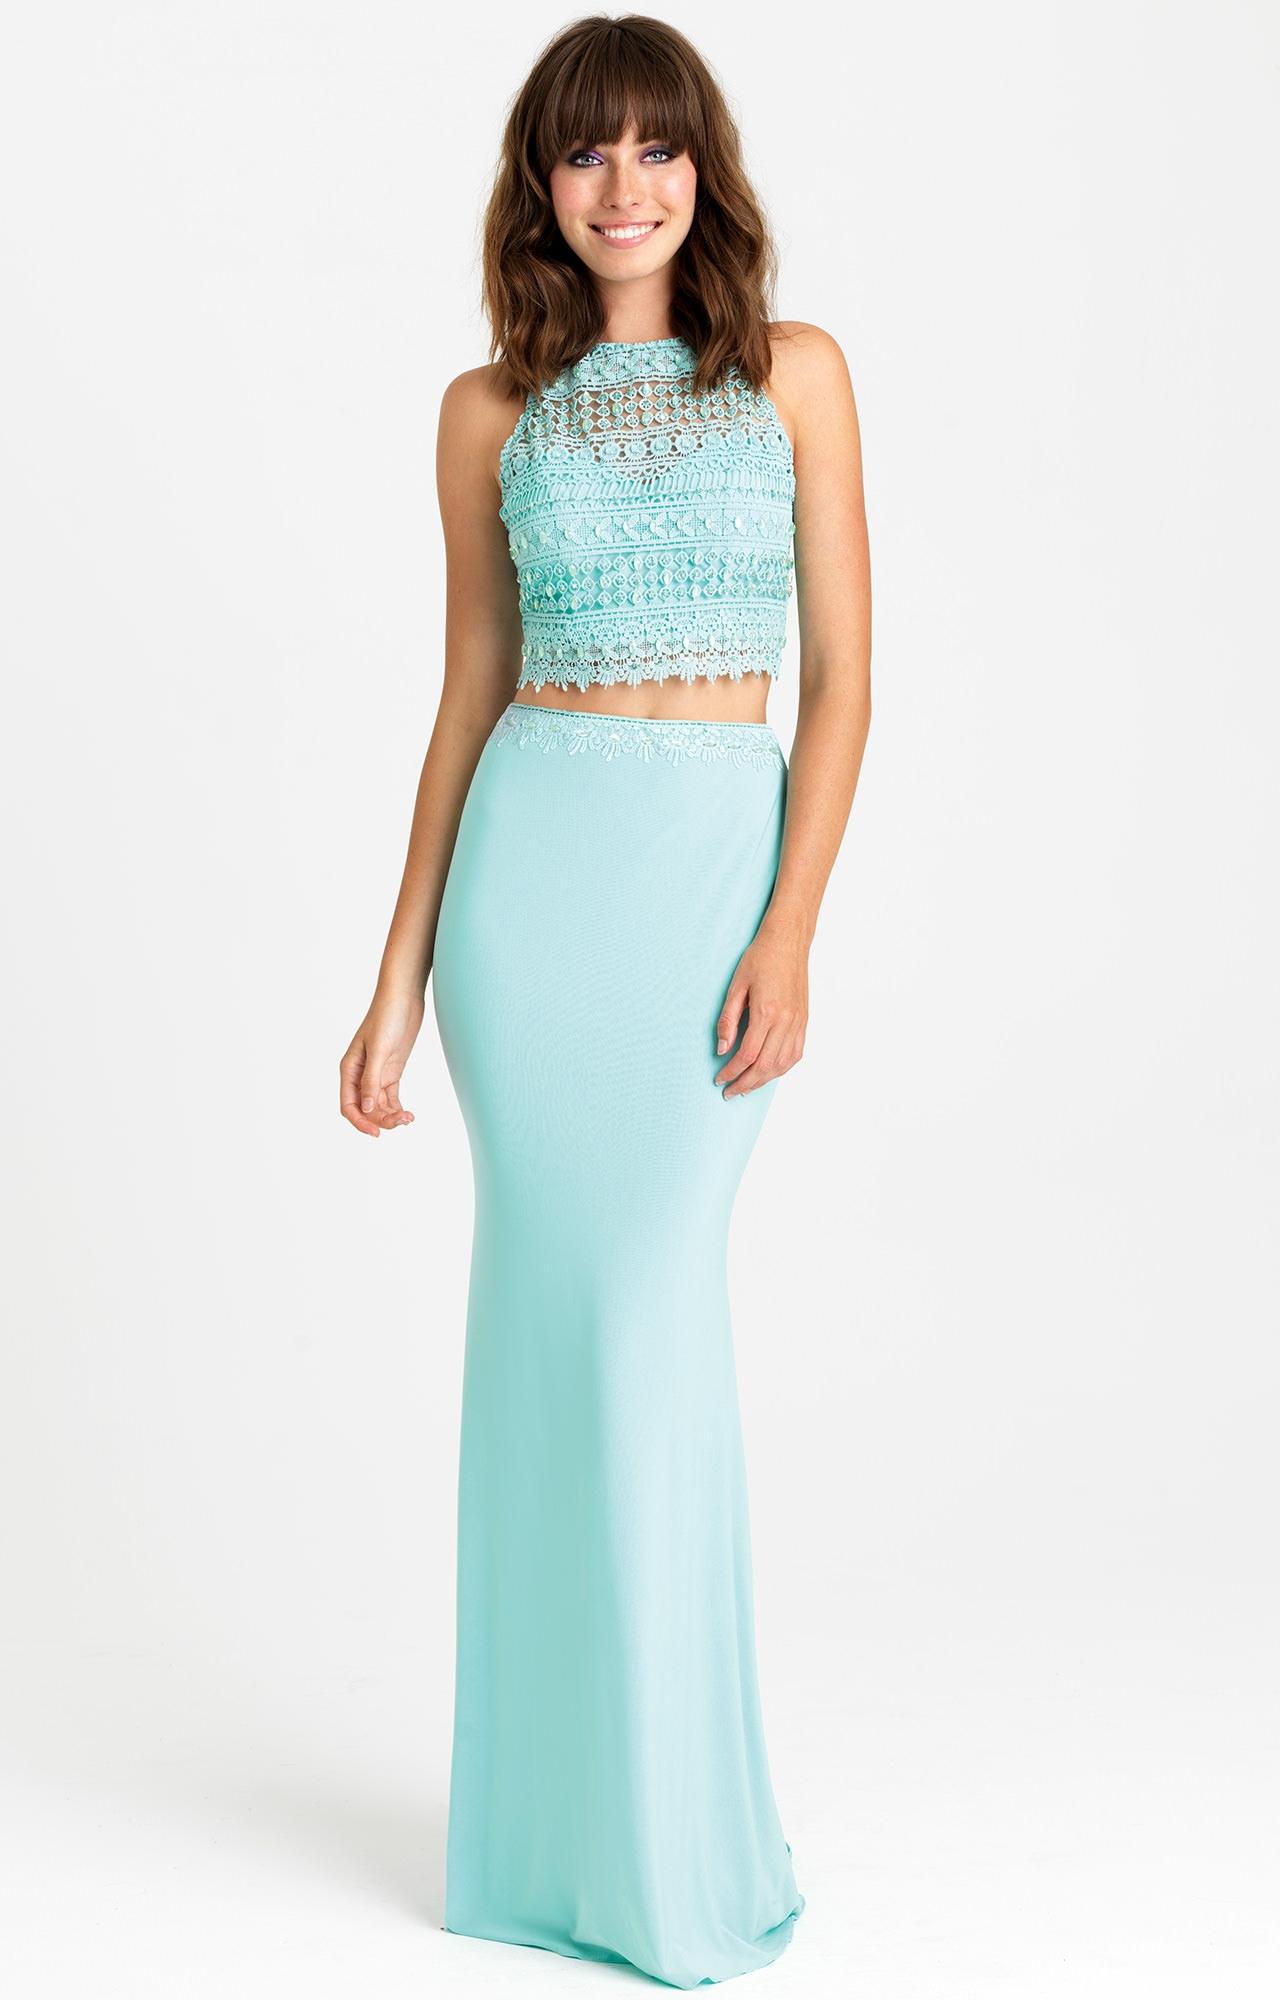 Madison James 16-412 - The Embroider-Me Dress Prom Dress